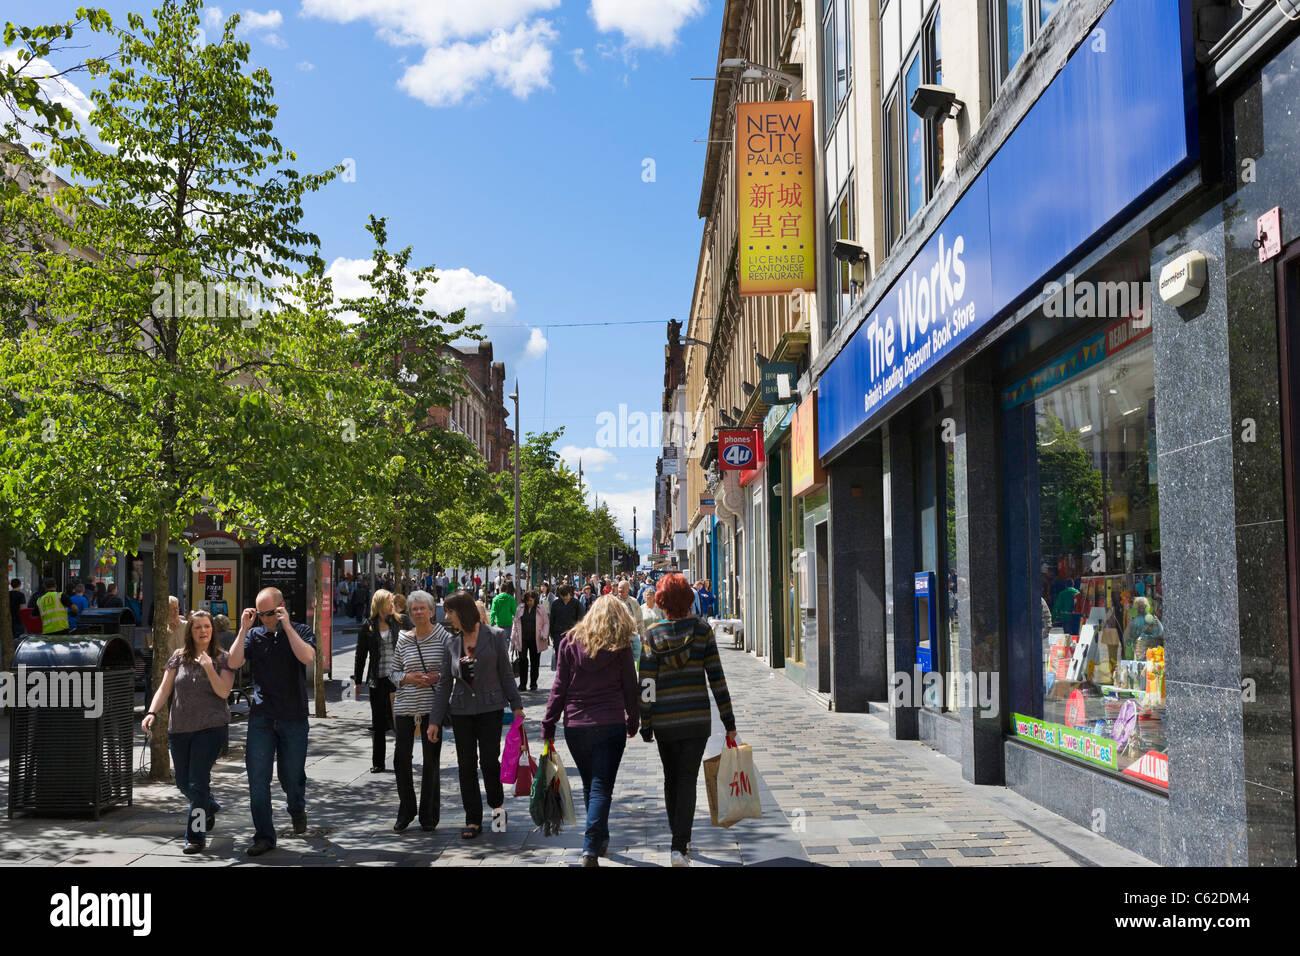 Shops on Sauchiehall Street in the city centre, Glasgow, Scotland, UK - Stock Image